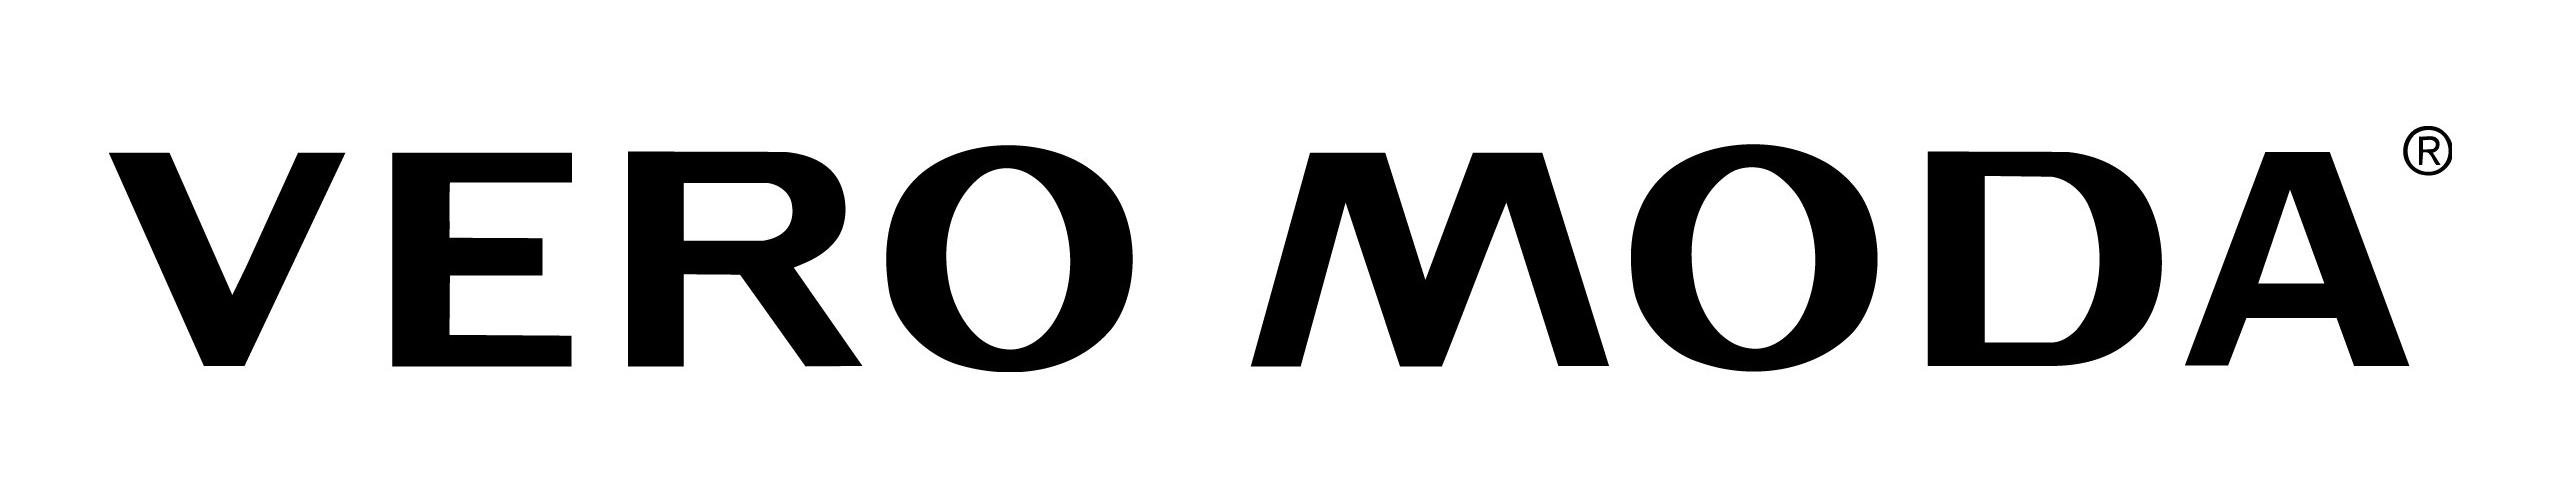 f6ceba84c1db9d Vero Moda – Logos Download